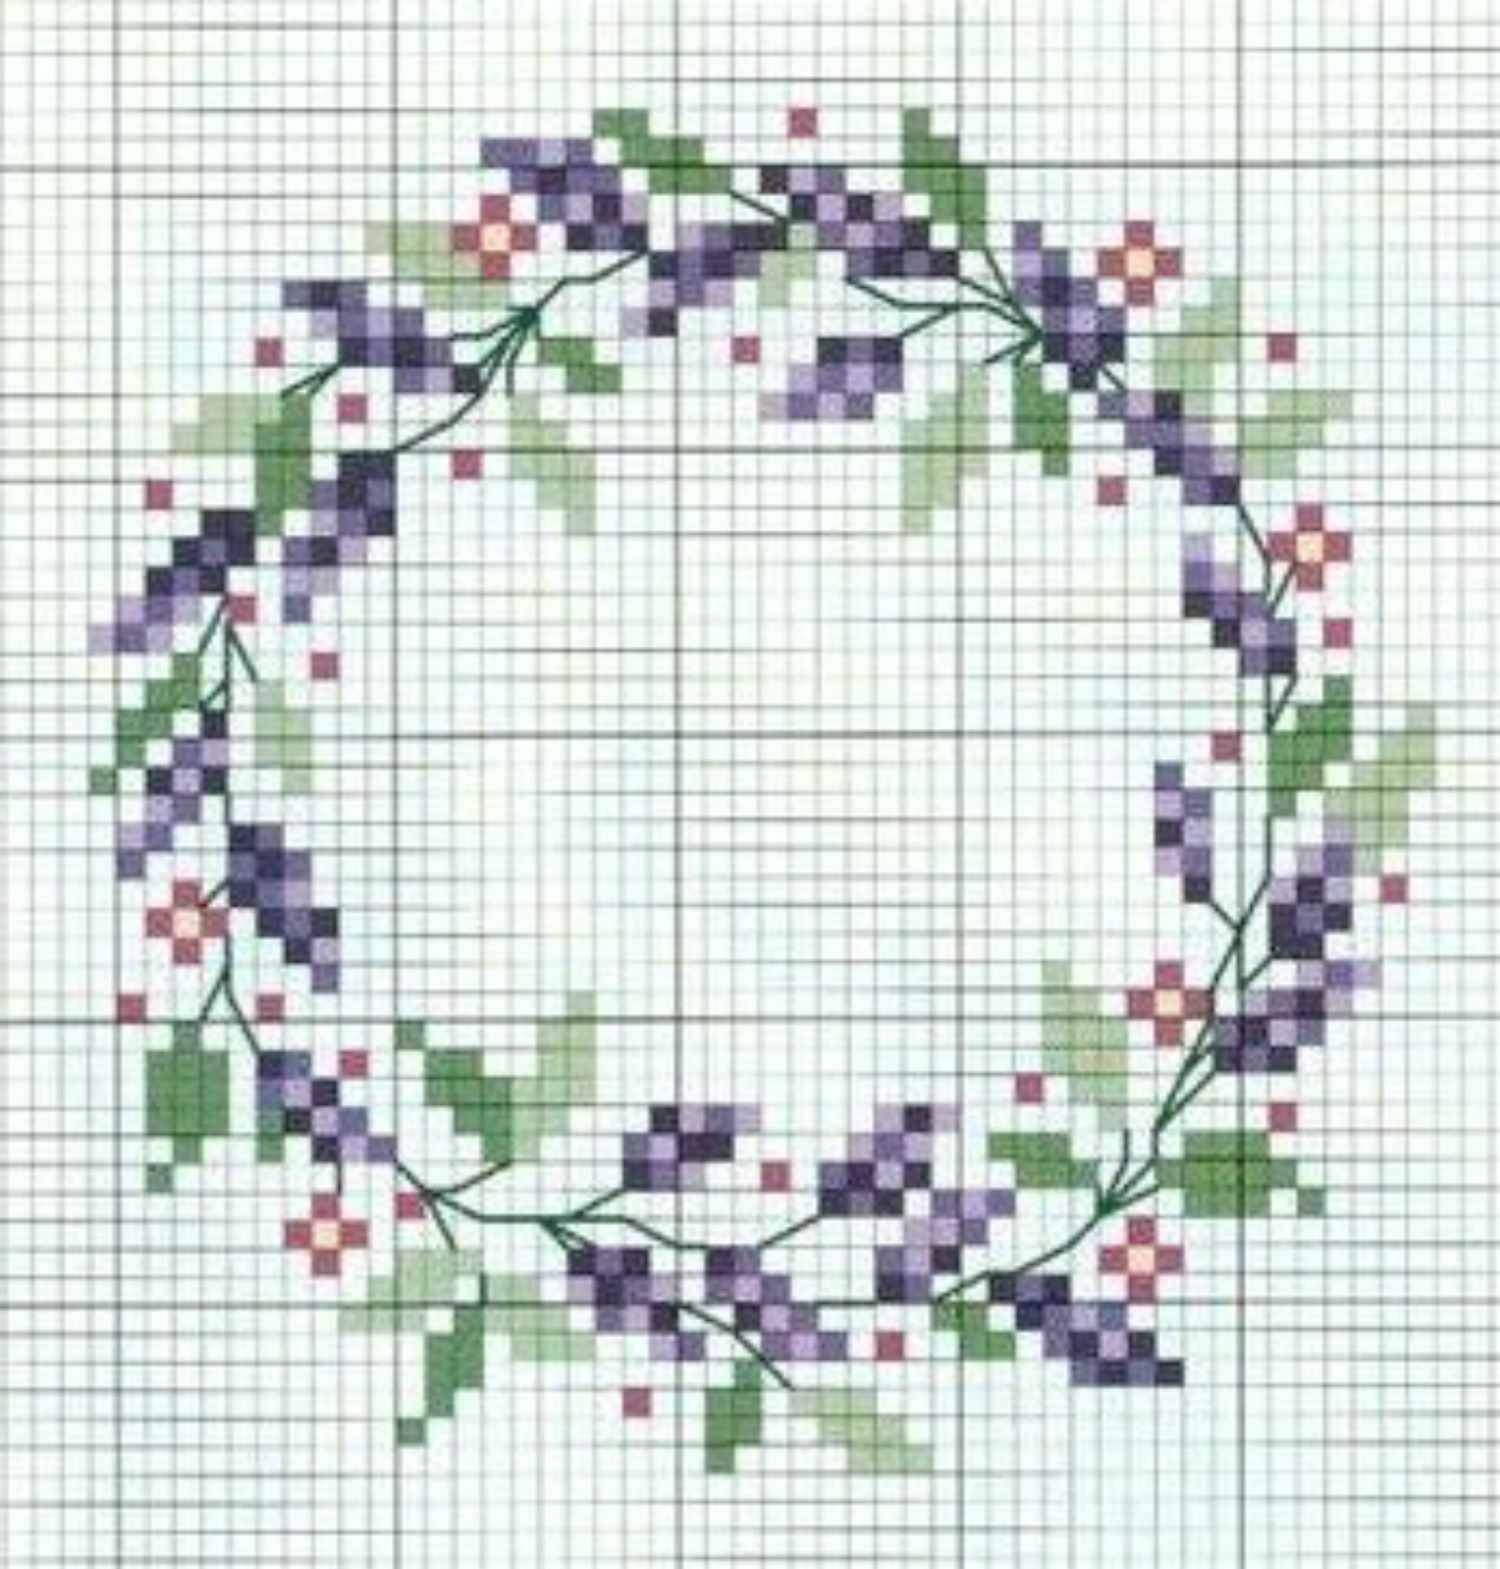 15 Floral Wreath Cross-Stitch Patterns - Free Printable Cross Stitch Patterns Flowers